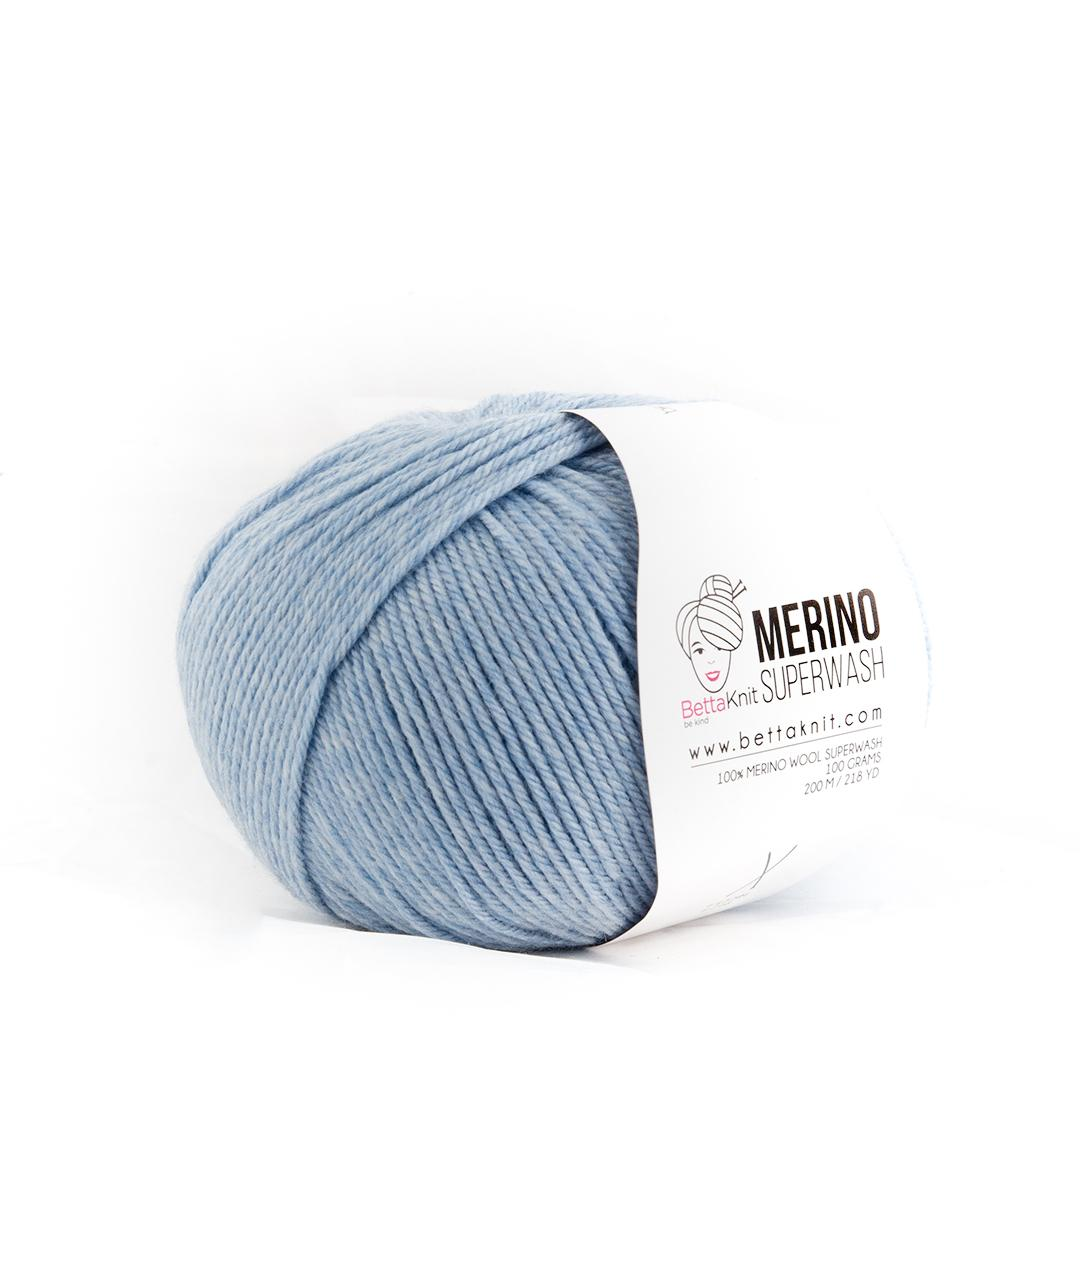 Sales - Wool - Merino Superwash - Blue Shades - 1